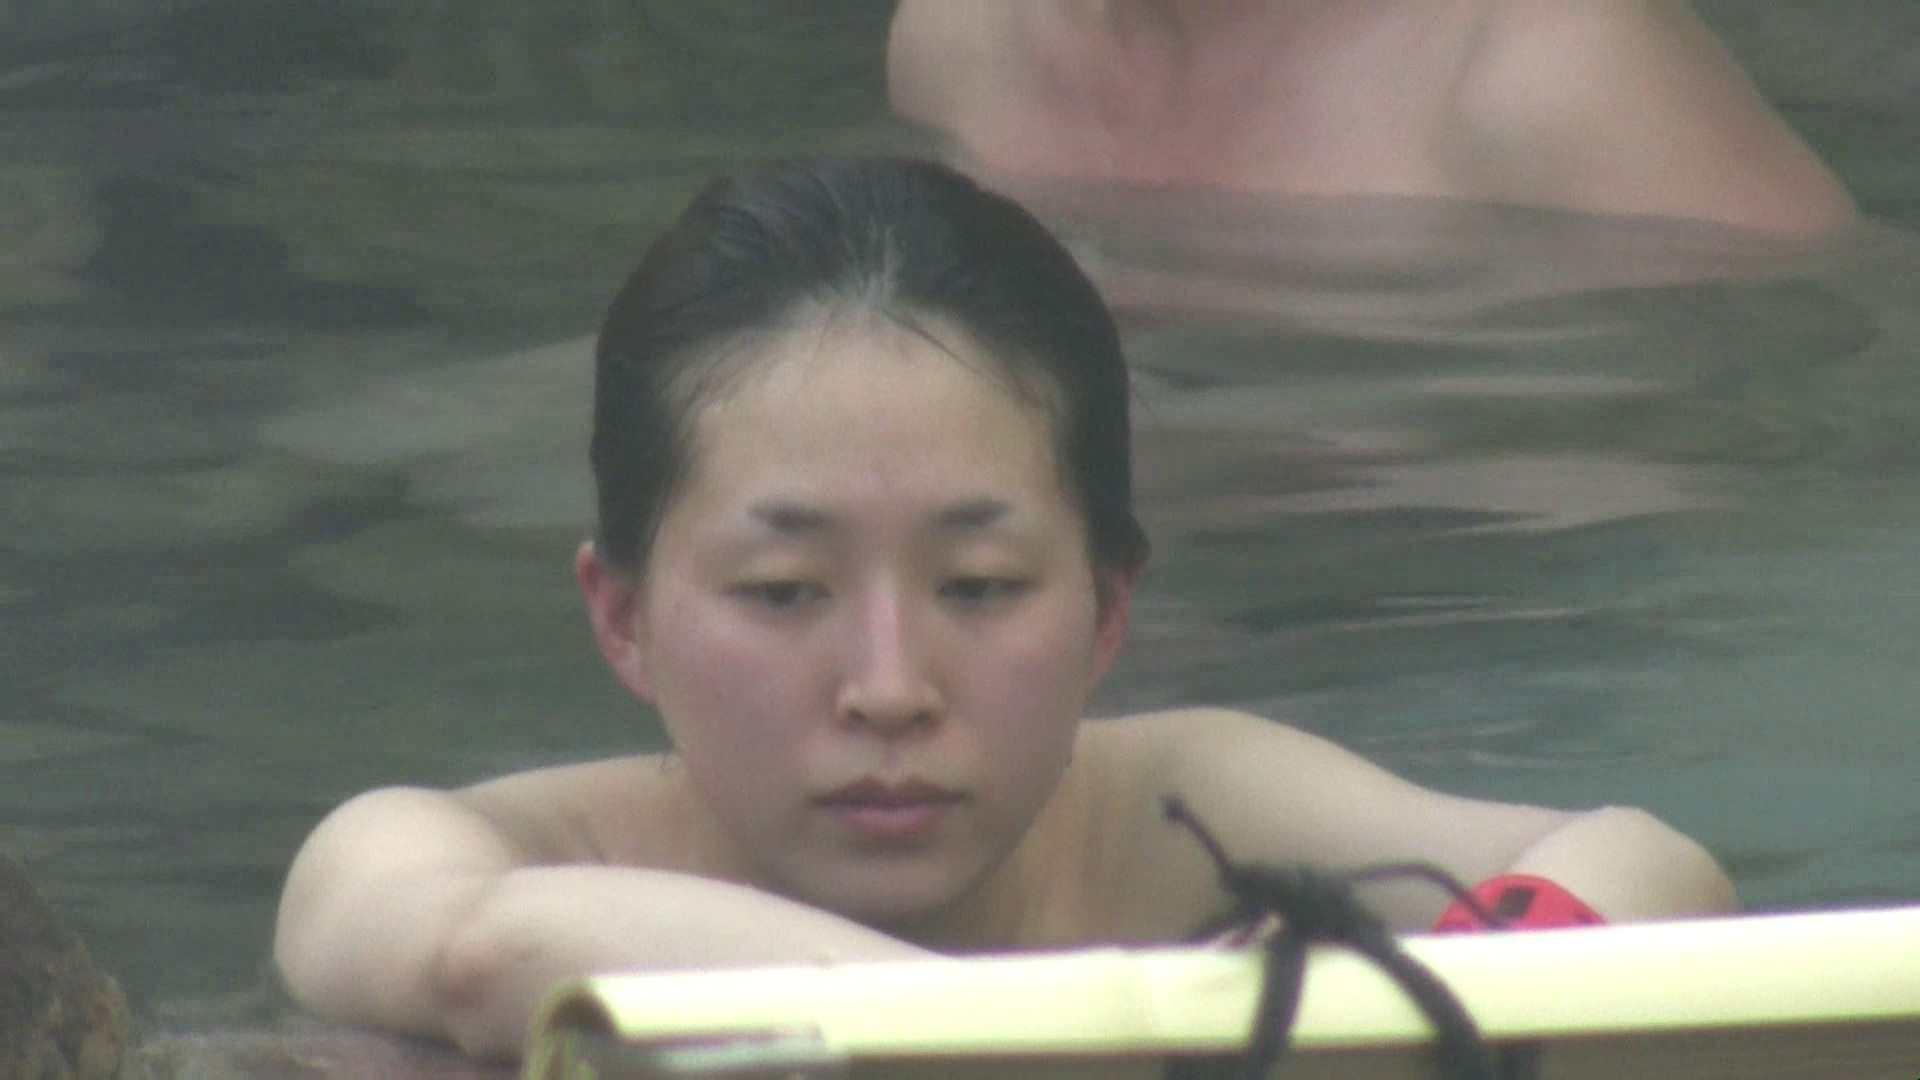 Aquaな露天風呂Vol.583 盗撮 戯れ無修正画像 106枚 65